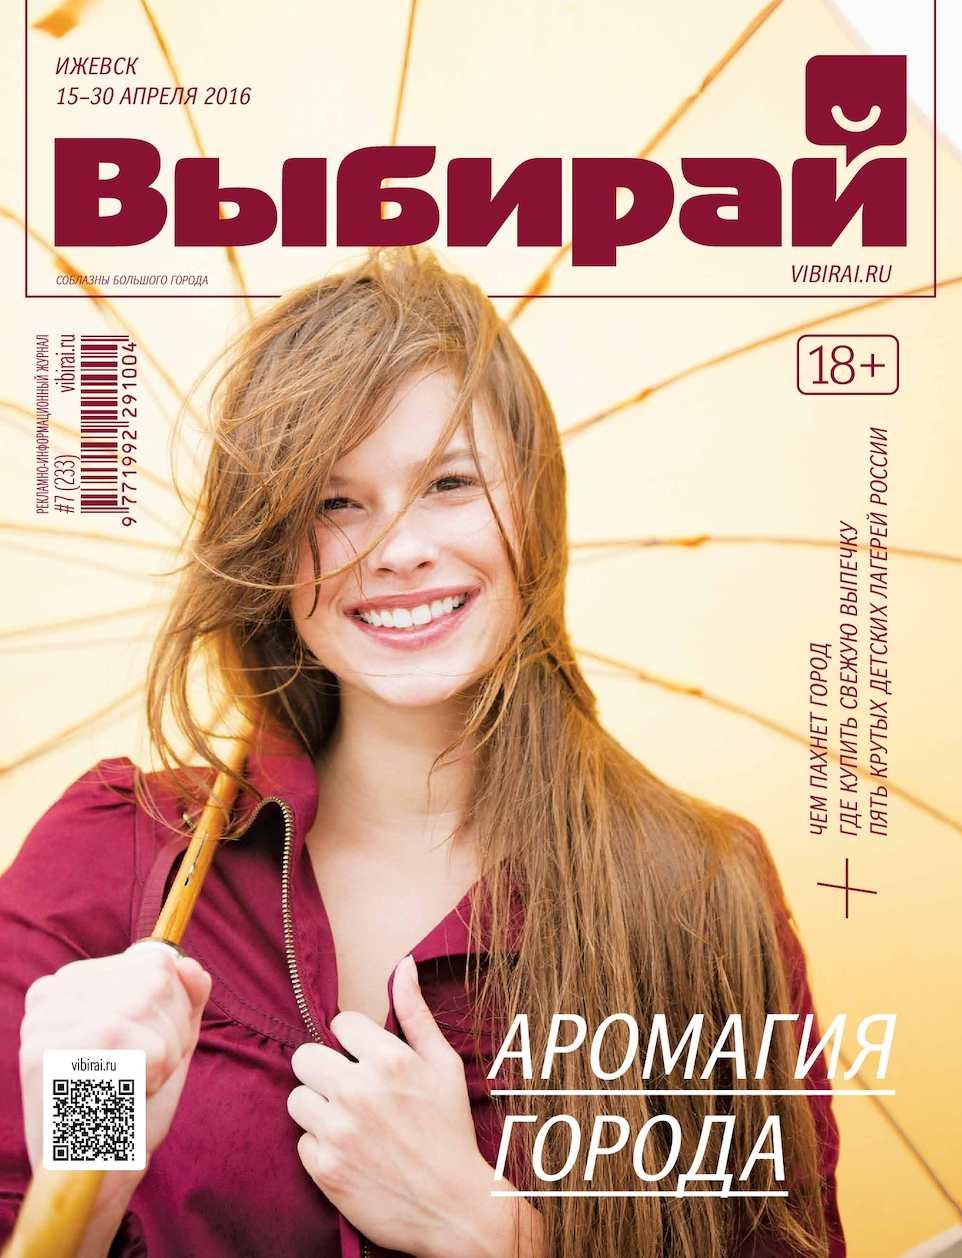 Юлия Агафонова В Лифчике – Корабль (1988)